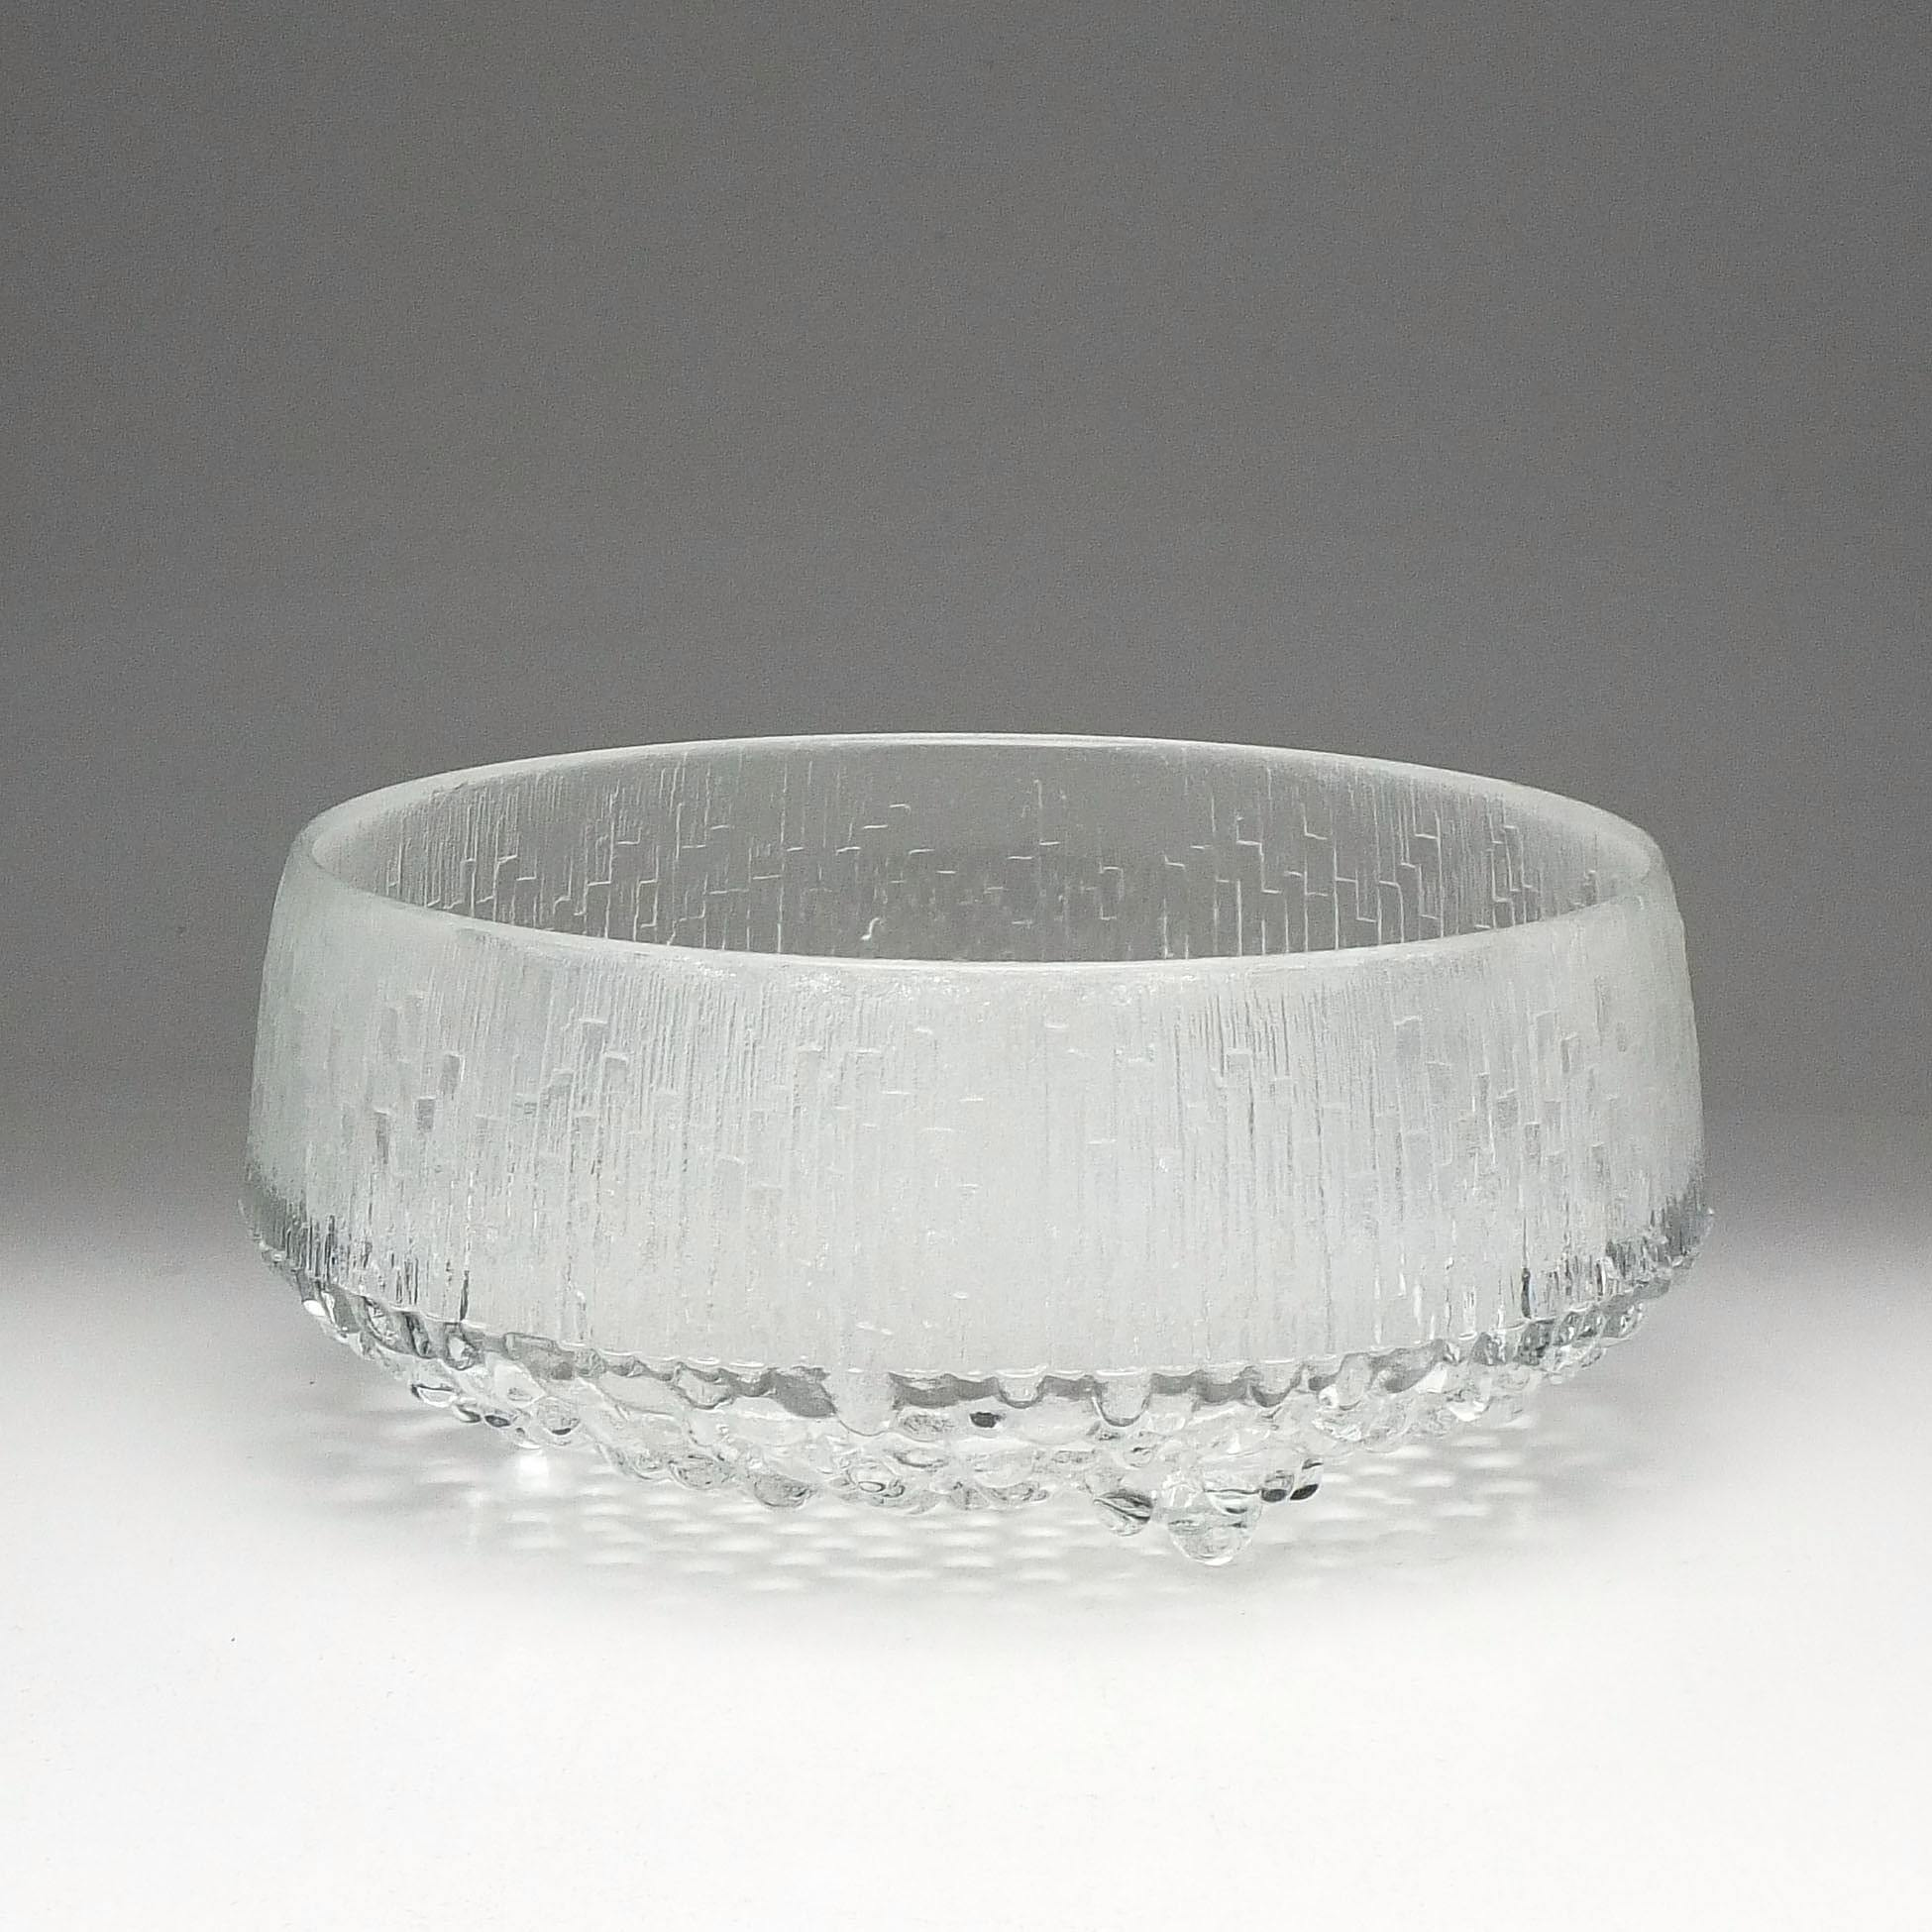 'Iittala Ultima Thule  Large Glass Fruit Bowl Designed by Tapio Wirkkala'